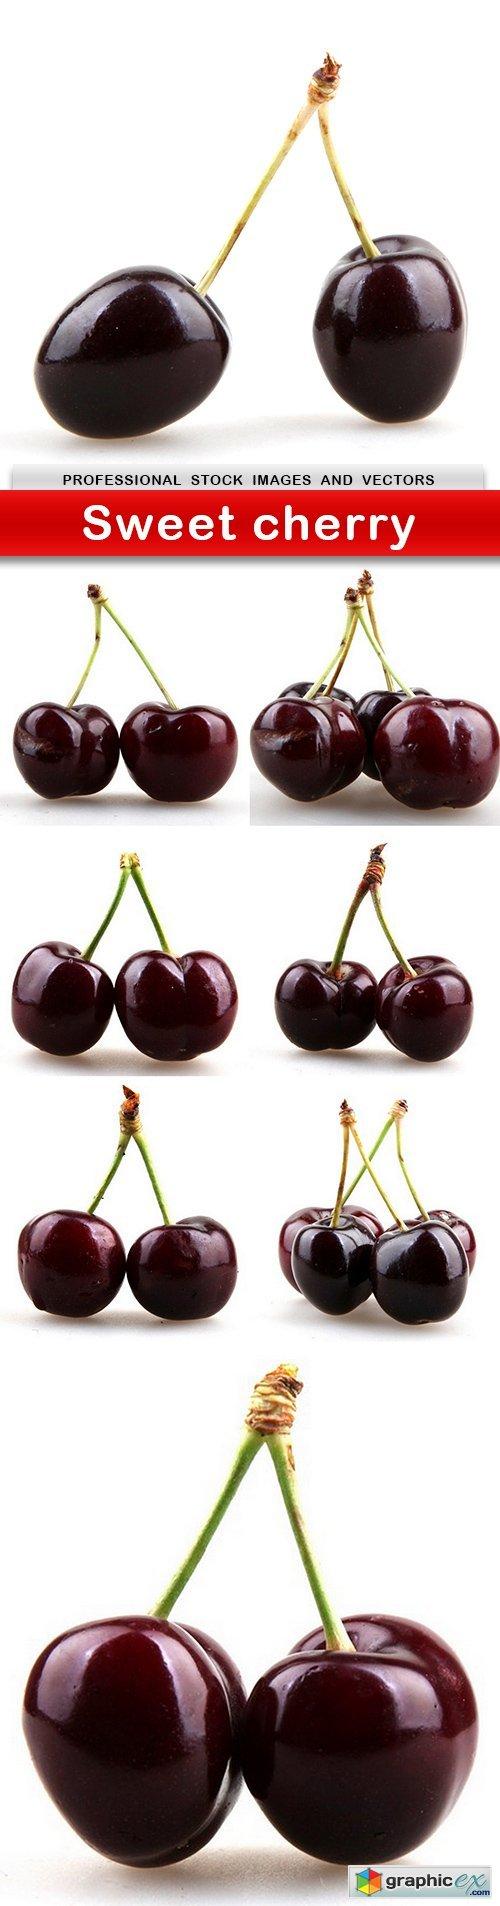 Sweet cherry - 8 UHQ JPEG